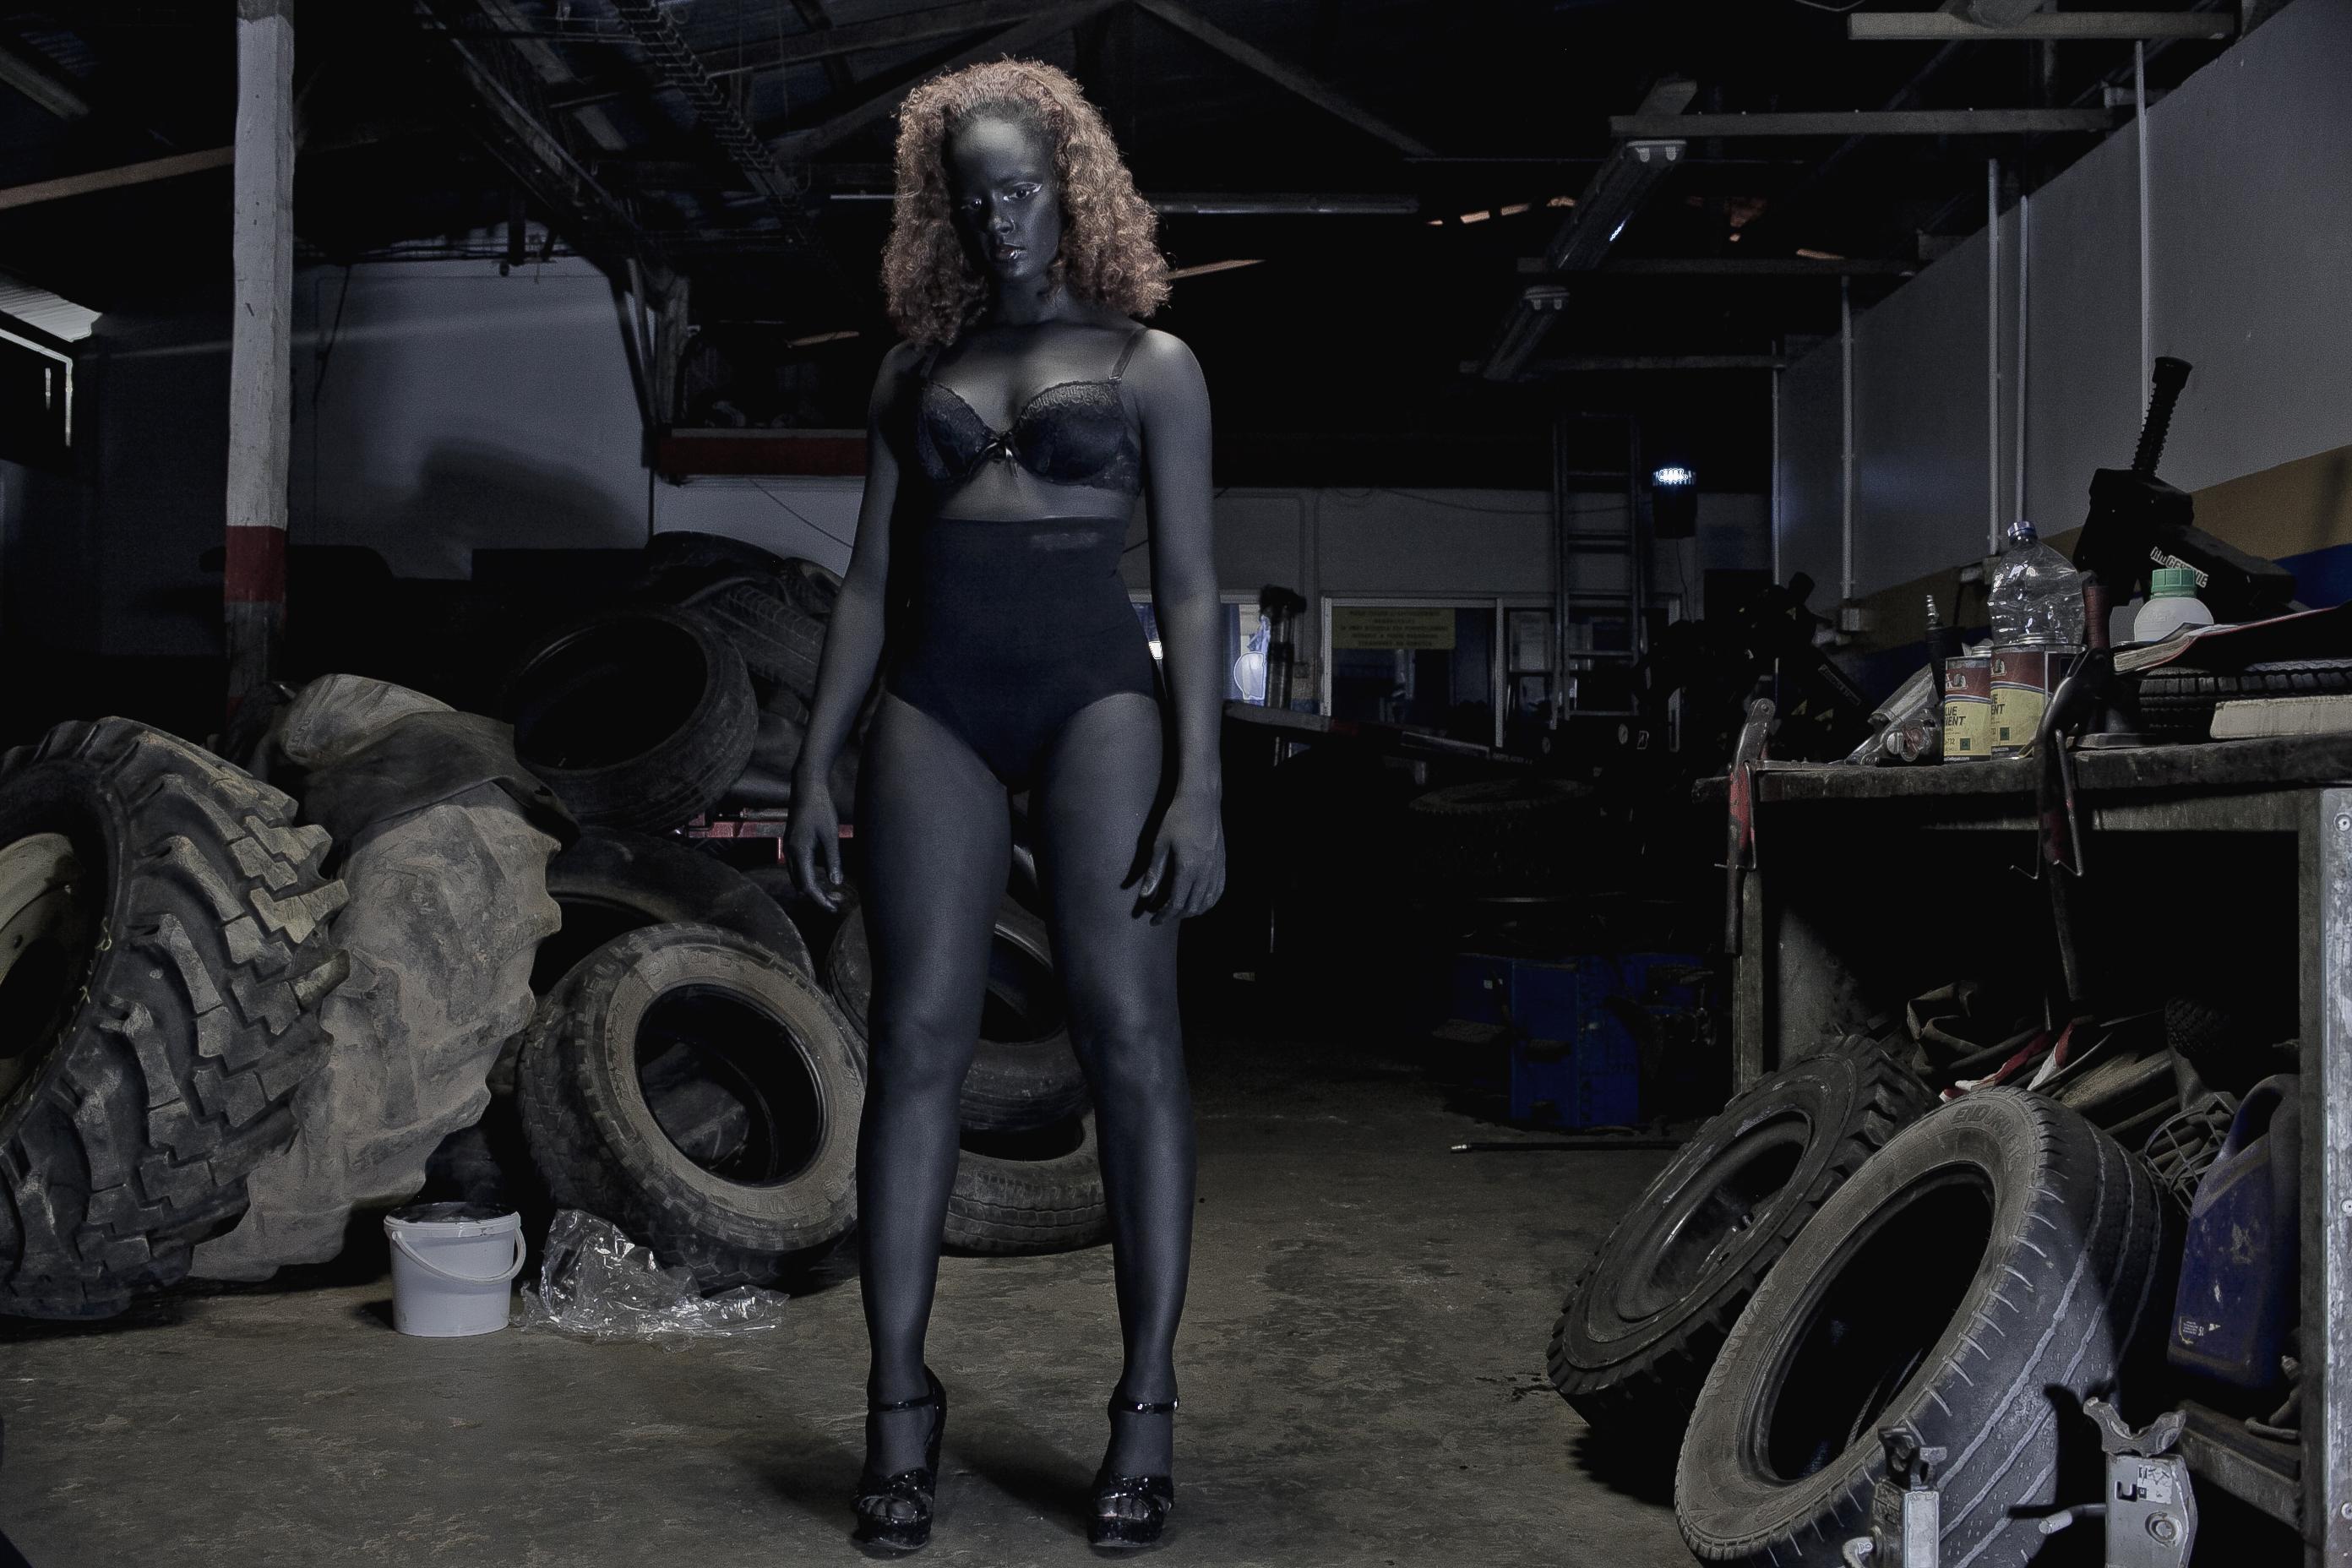 Black Dolls Returns for FotoWeekDC!